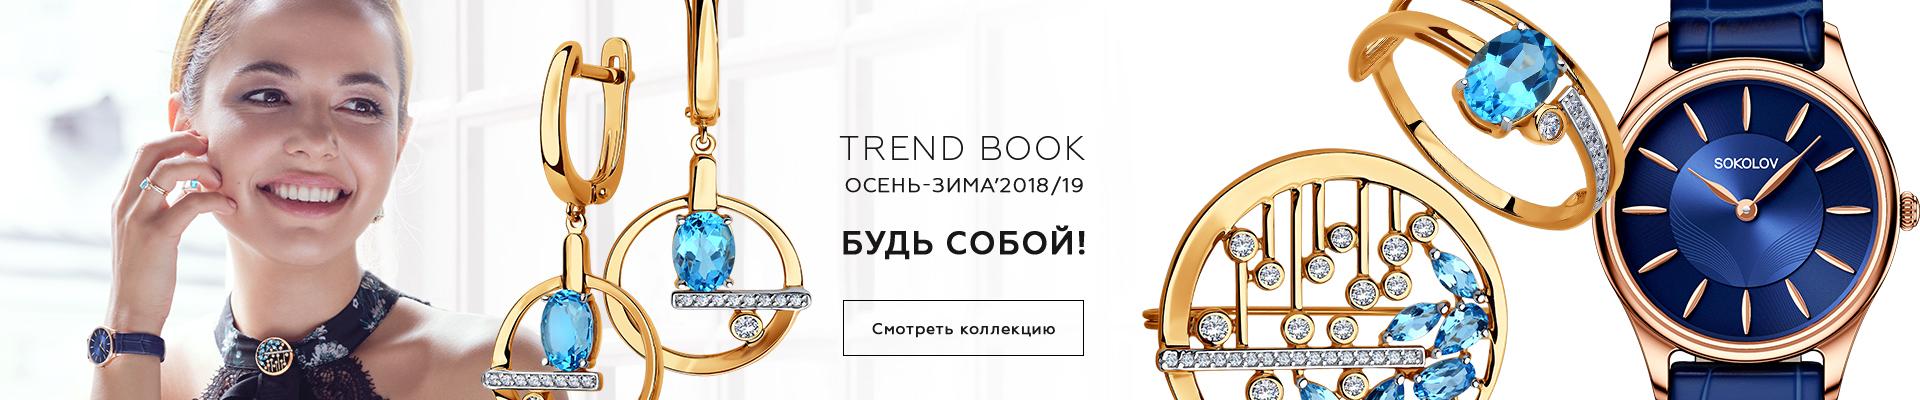 Sokolov TREND BOOK '18